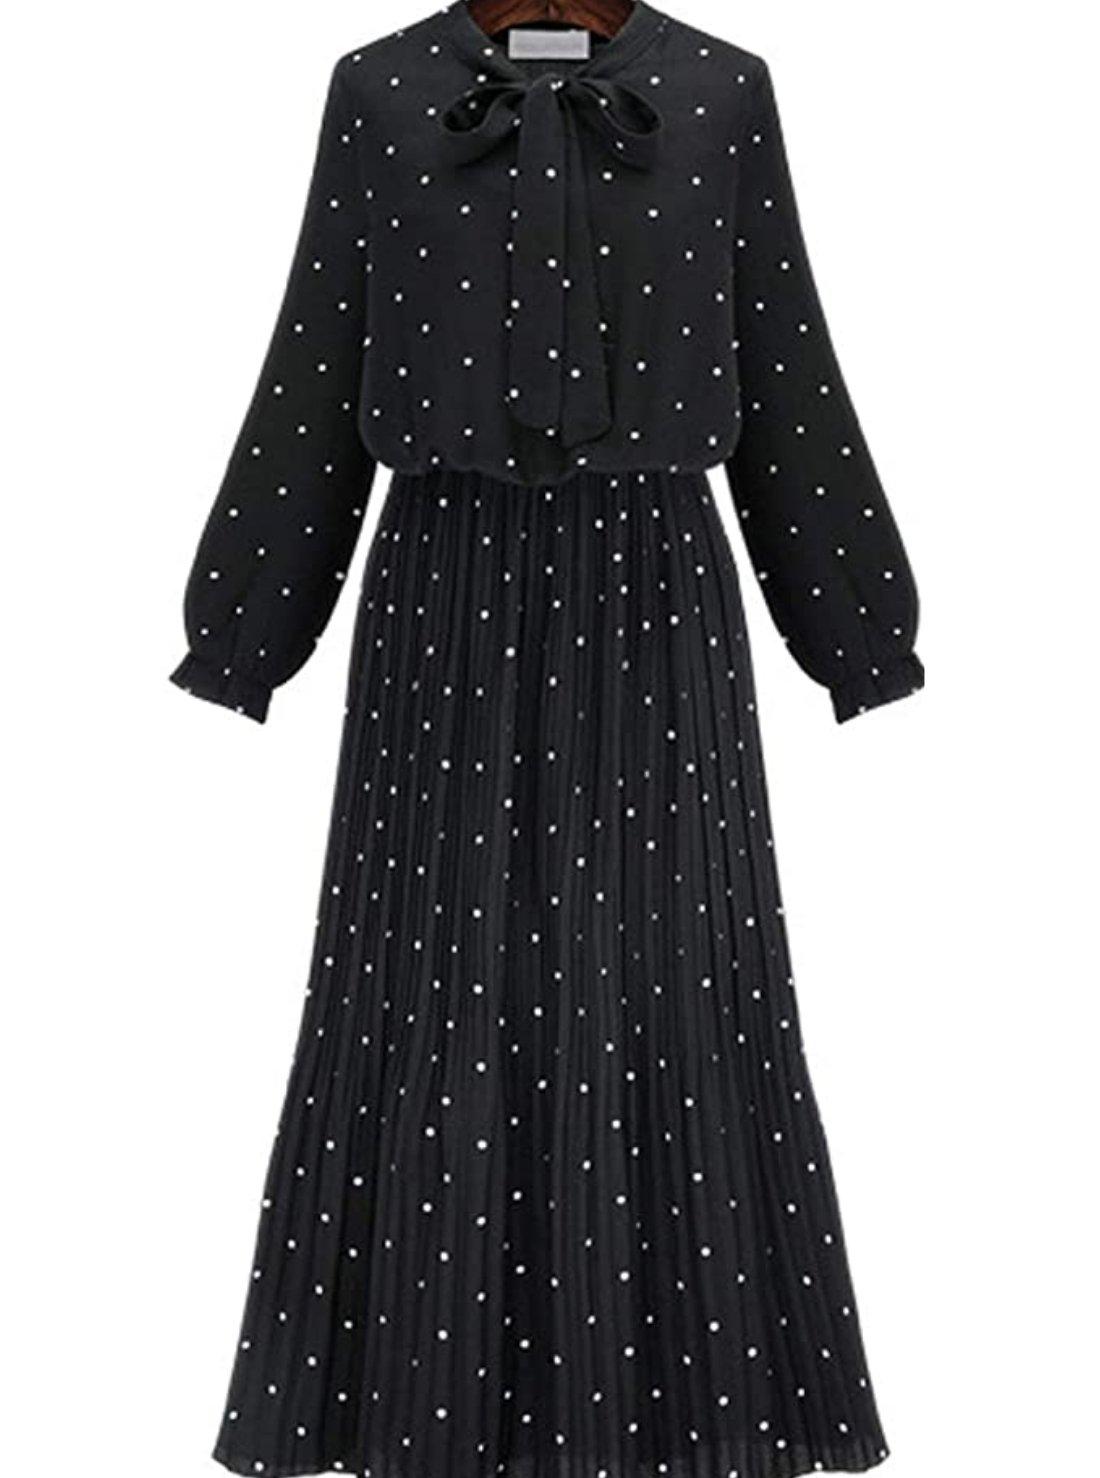 Wholesale Polka Dot Chiffon Dress